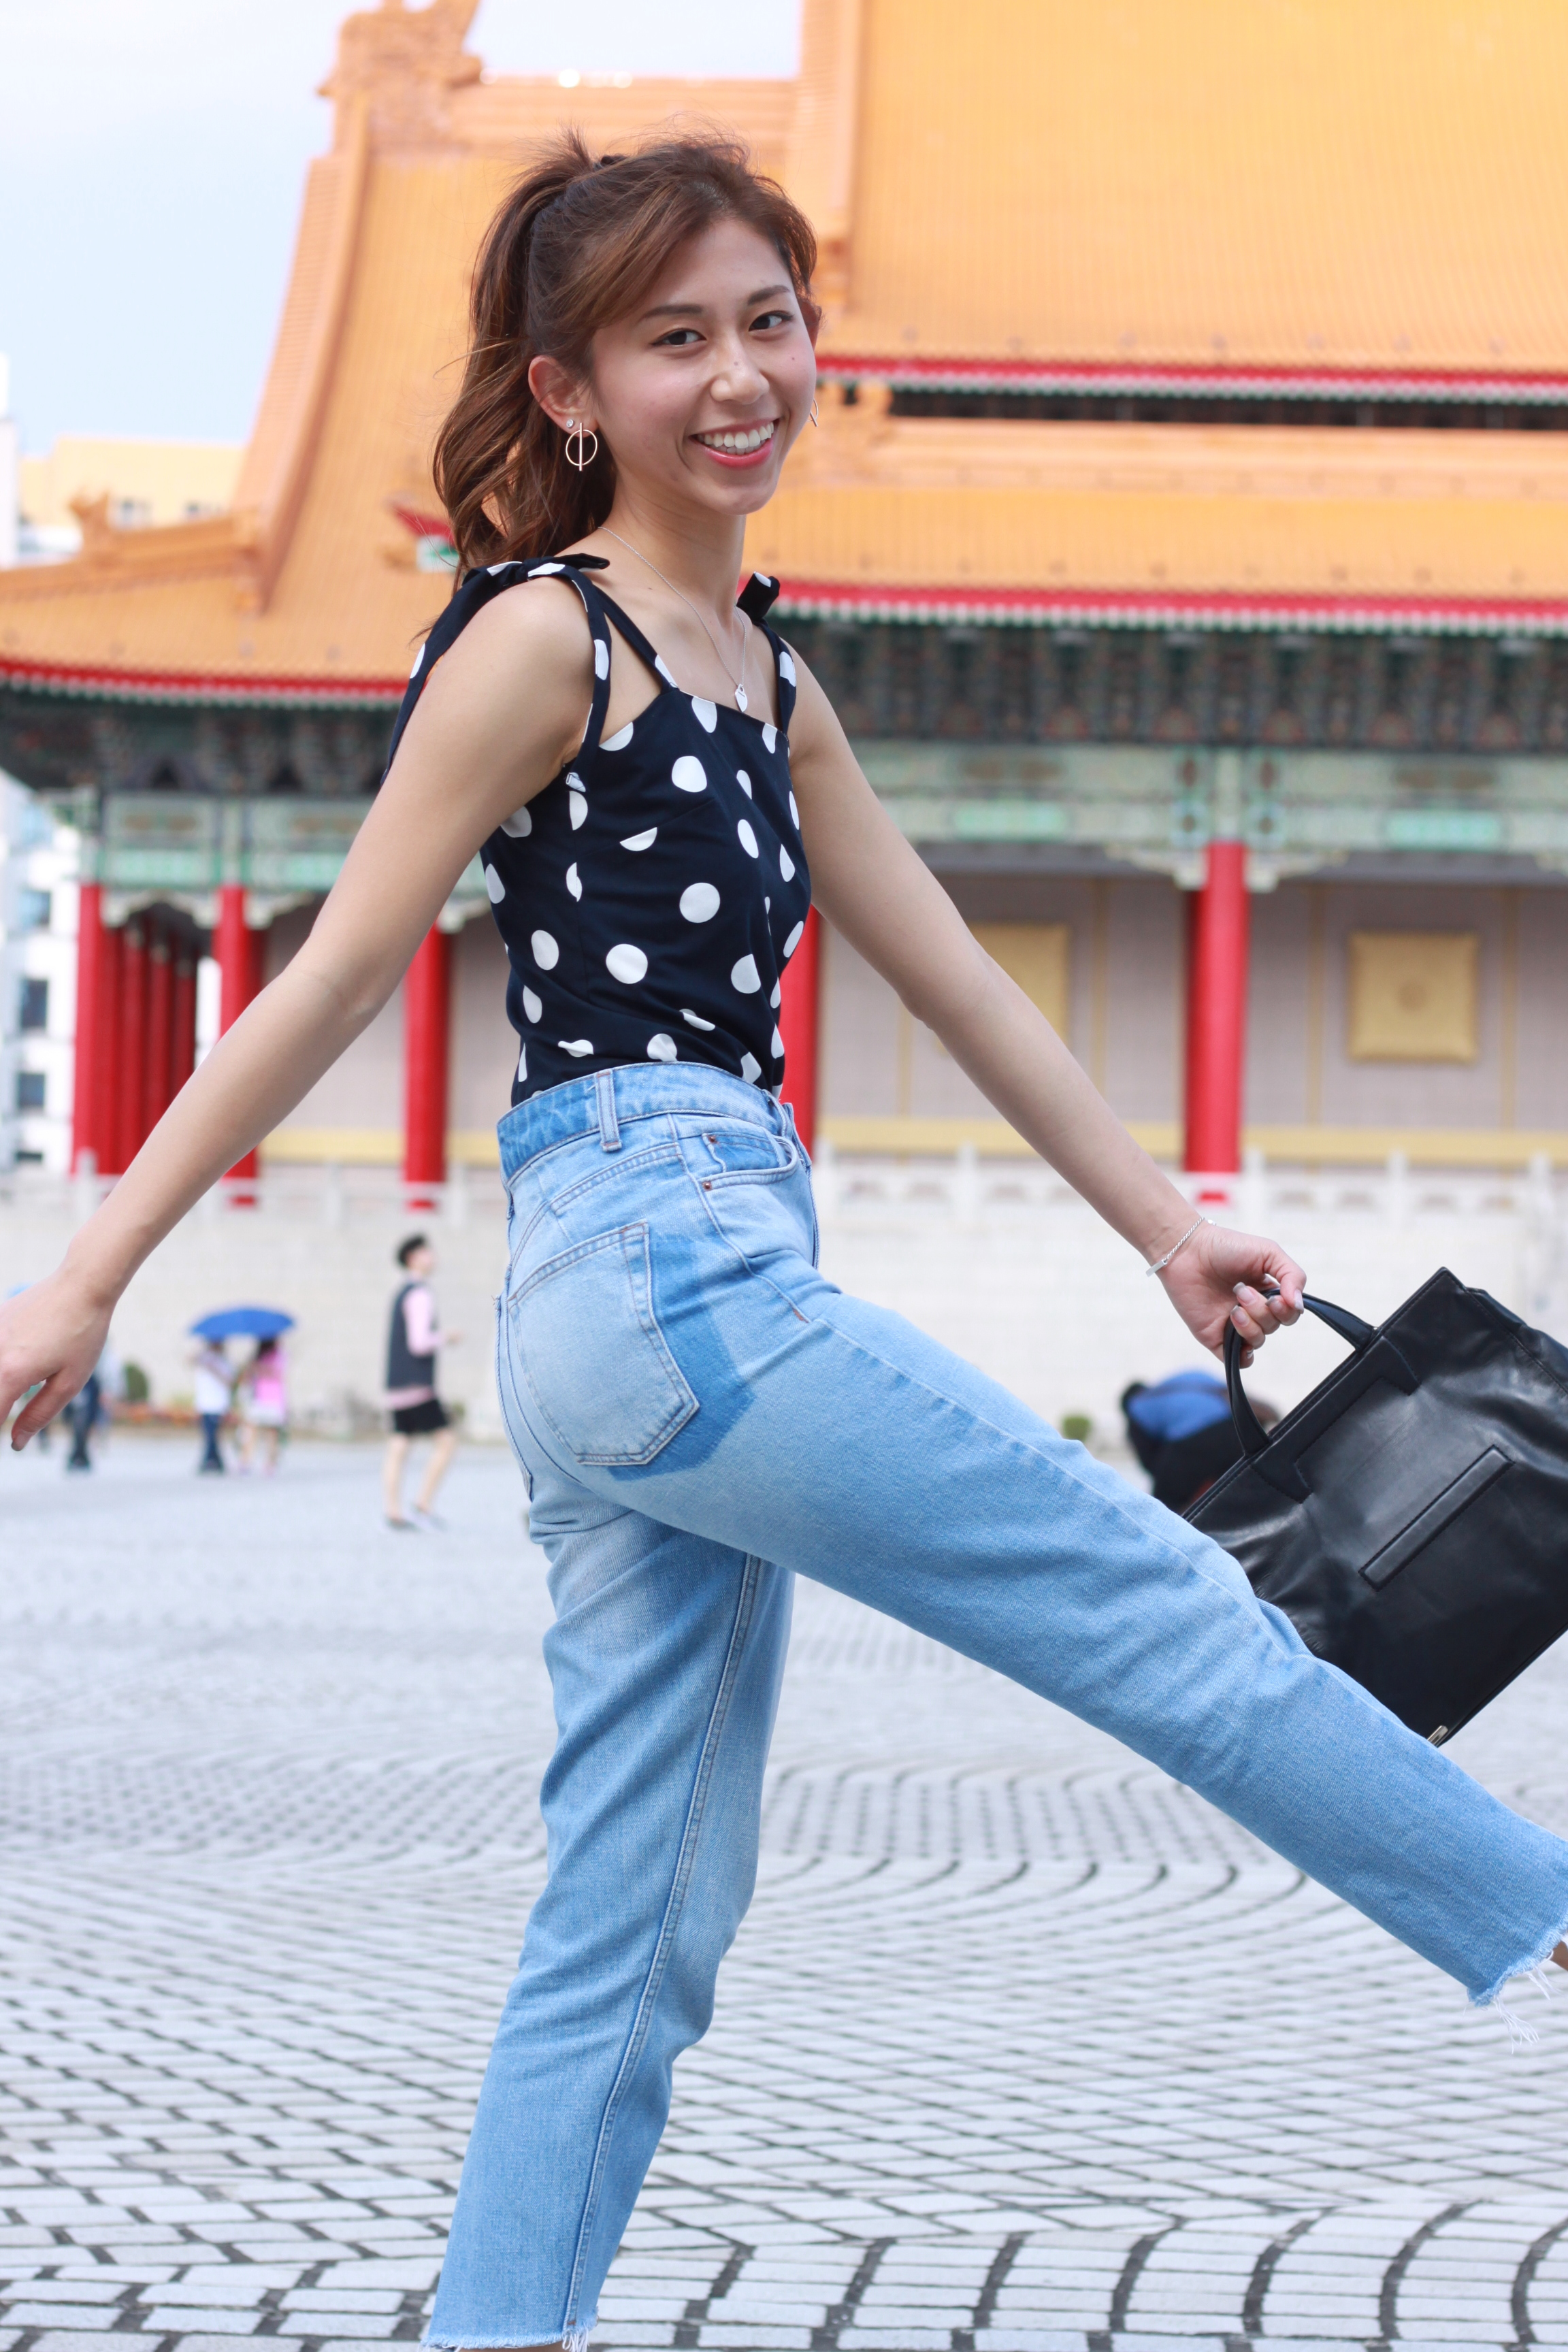 Zara Polka Dot Bodysuit  /  Topshop Seam Detail MOM jeans  /  Zara Fabric Slingback shoes